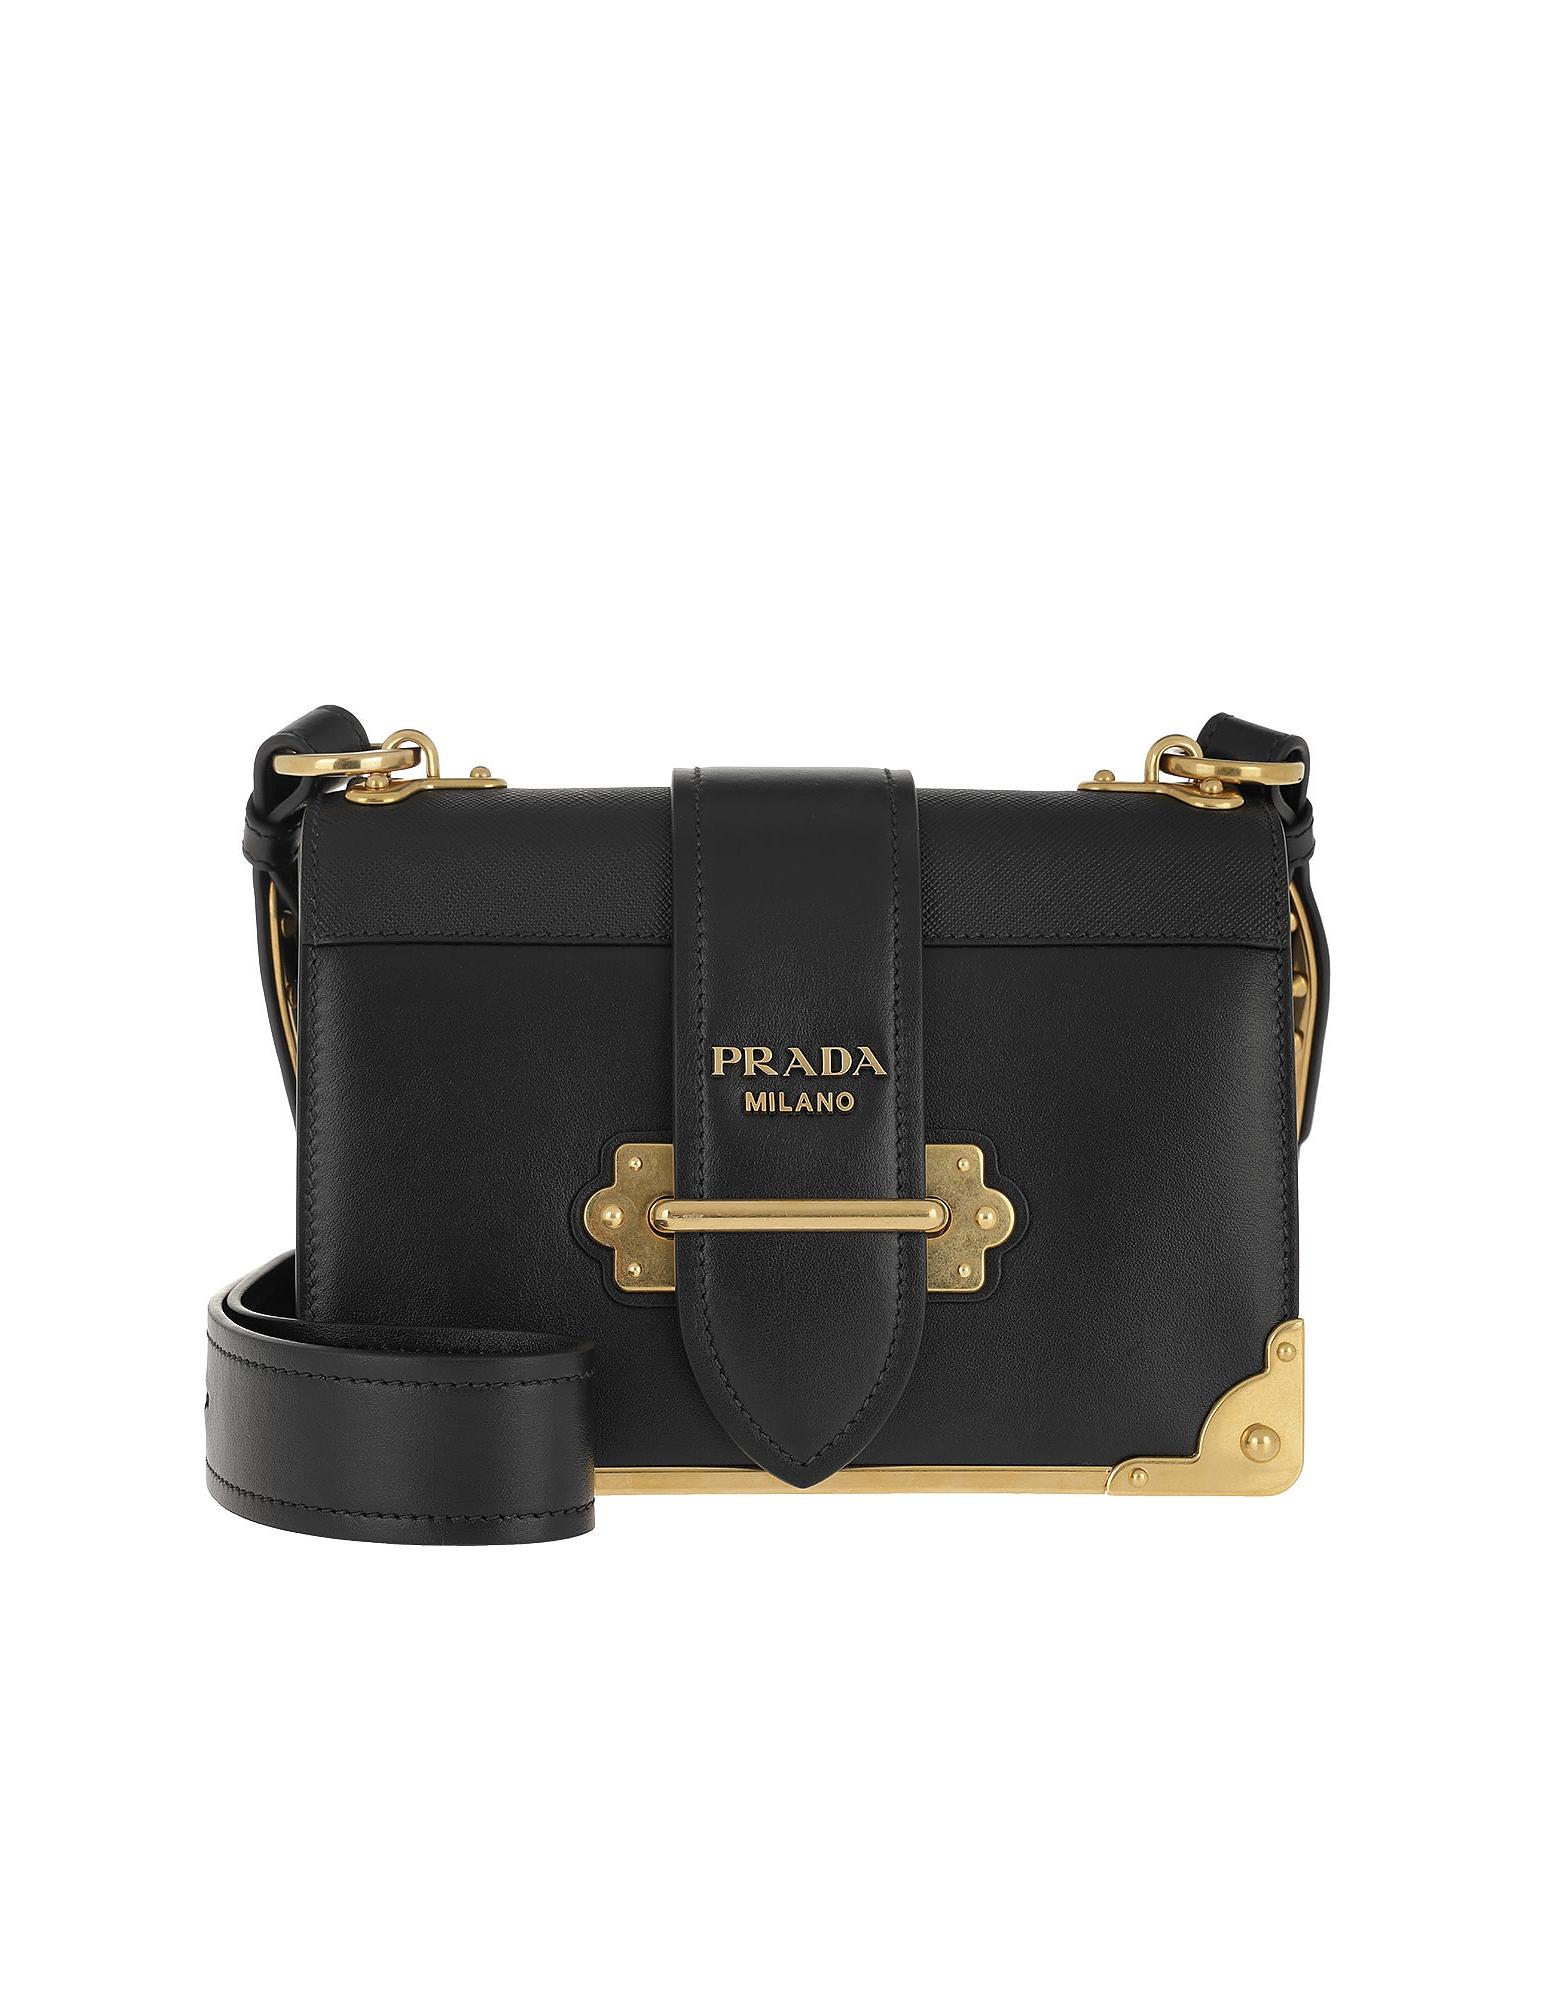 Prada Handbags, Cahier Crossbody Bag Black